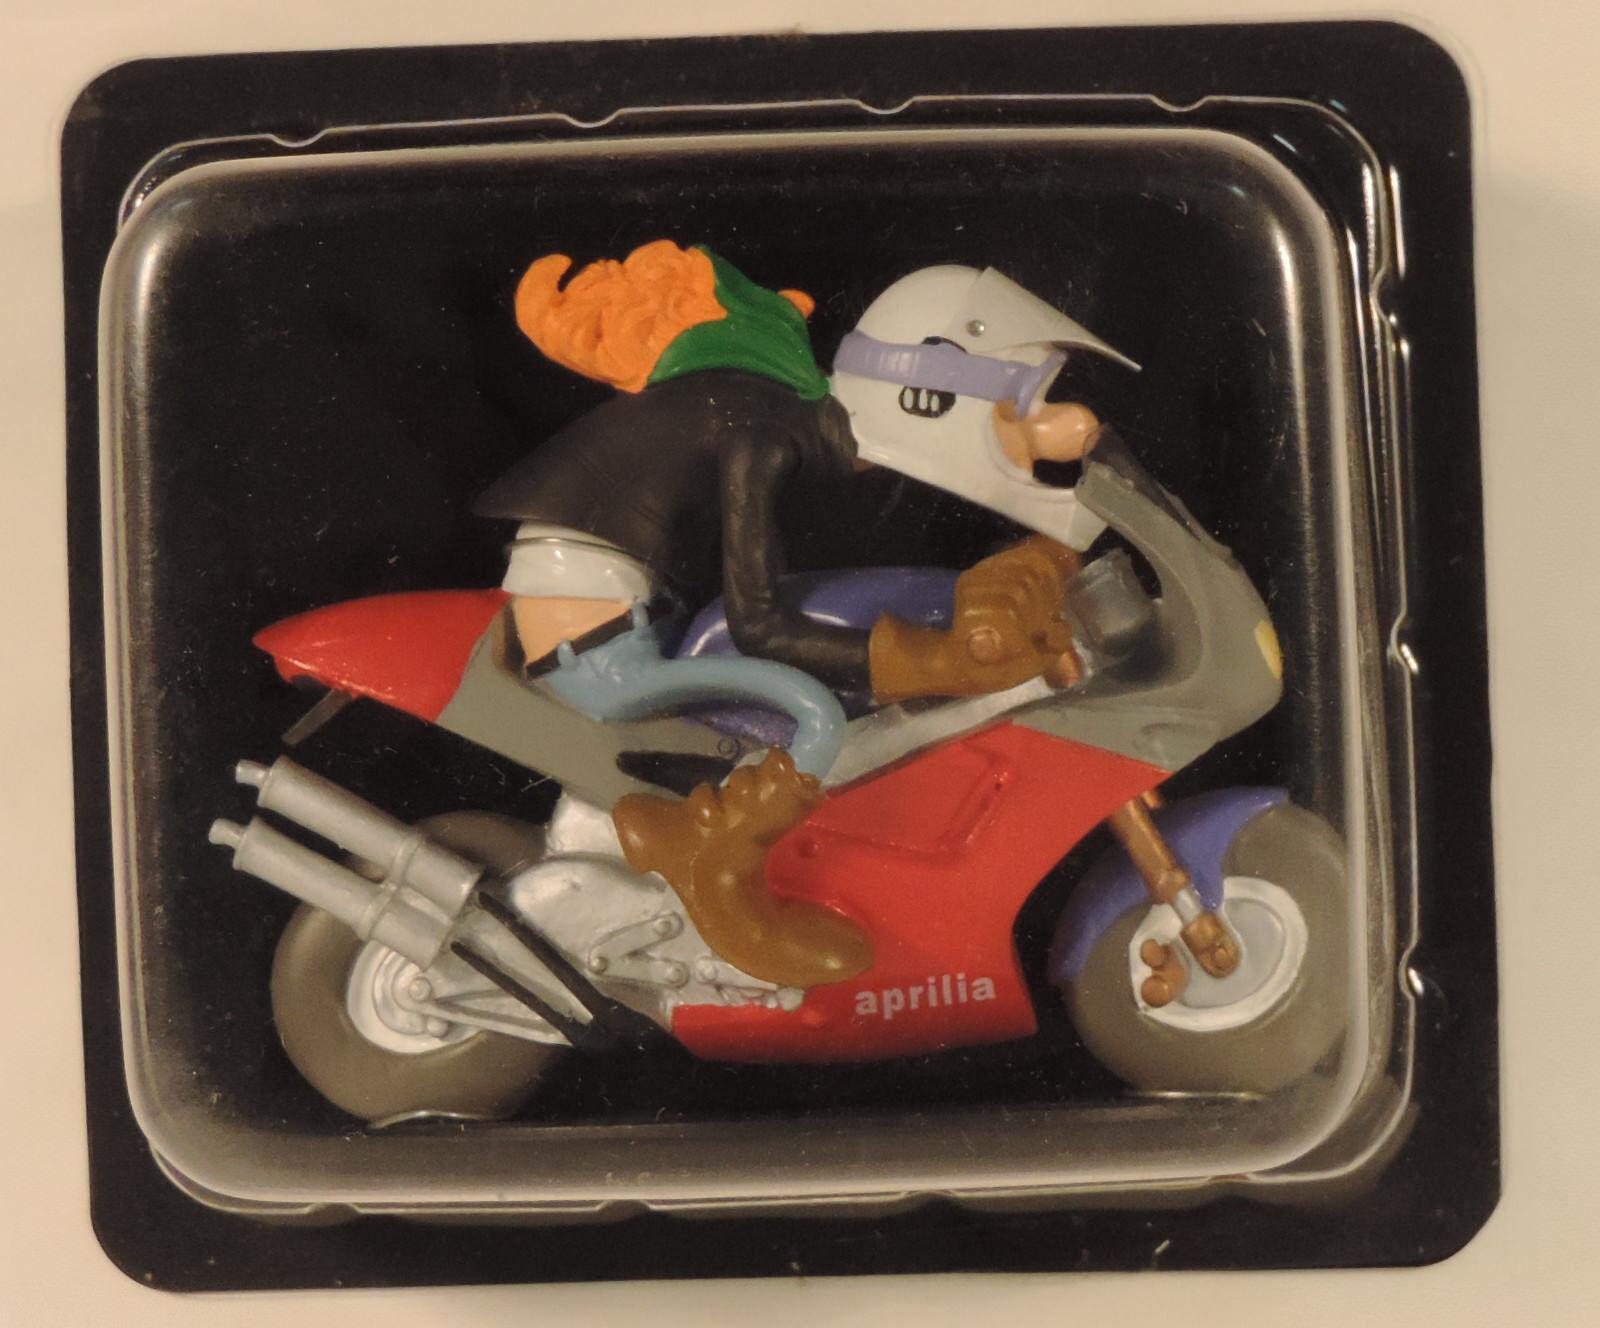 Moto Joe Bar Team 102 102 102 Aprilia 250 RS de 1995 1 18 figurine Hachette cac5f0